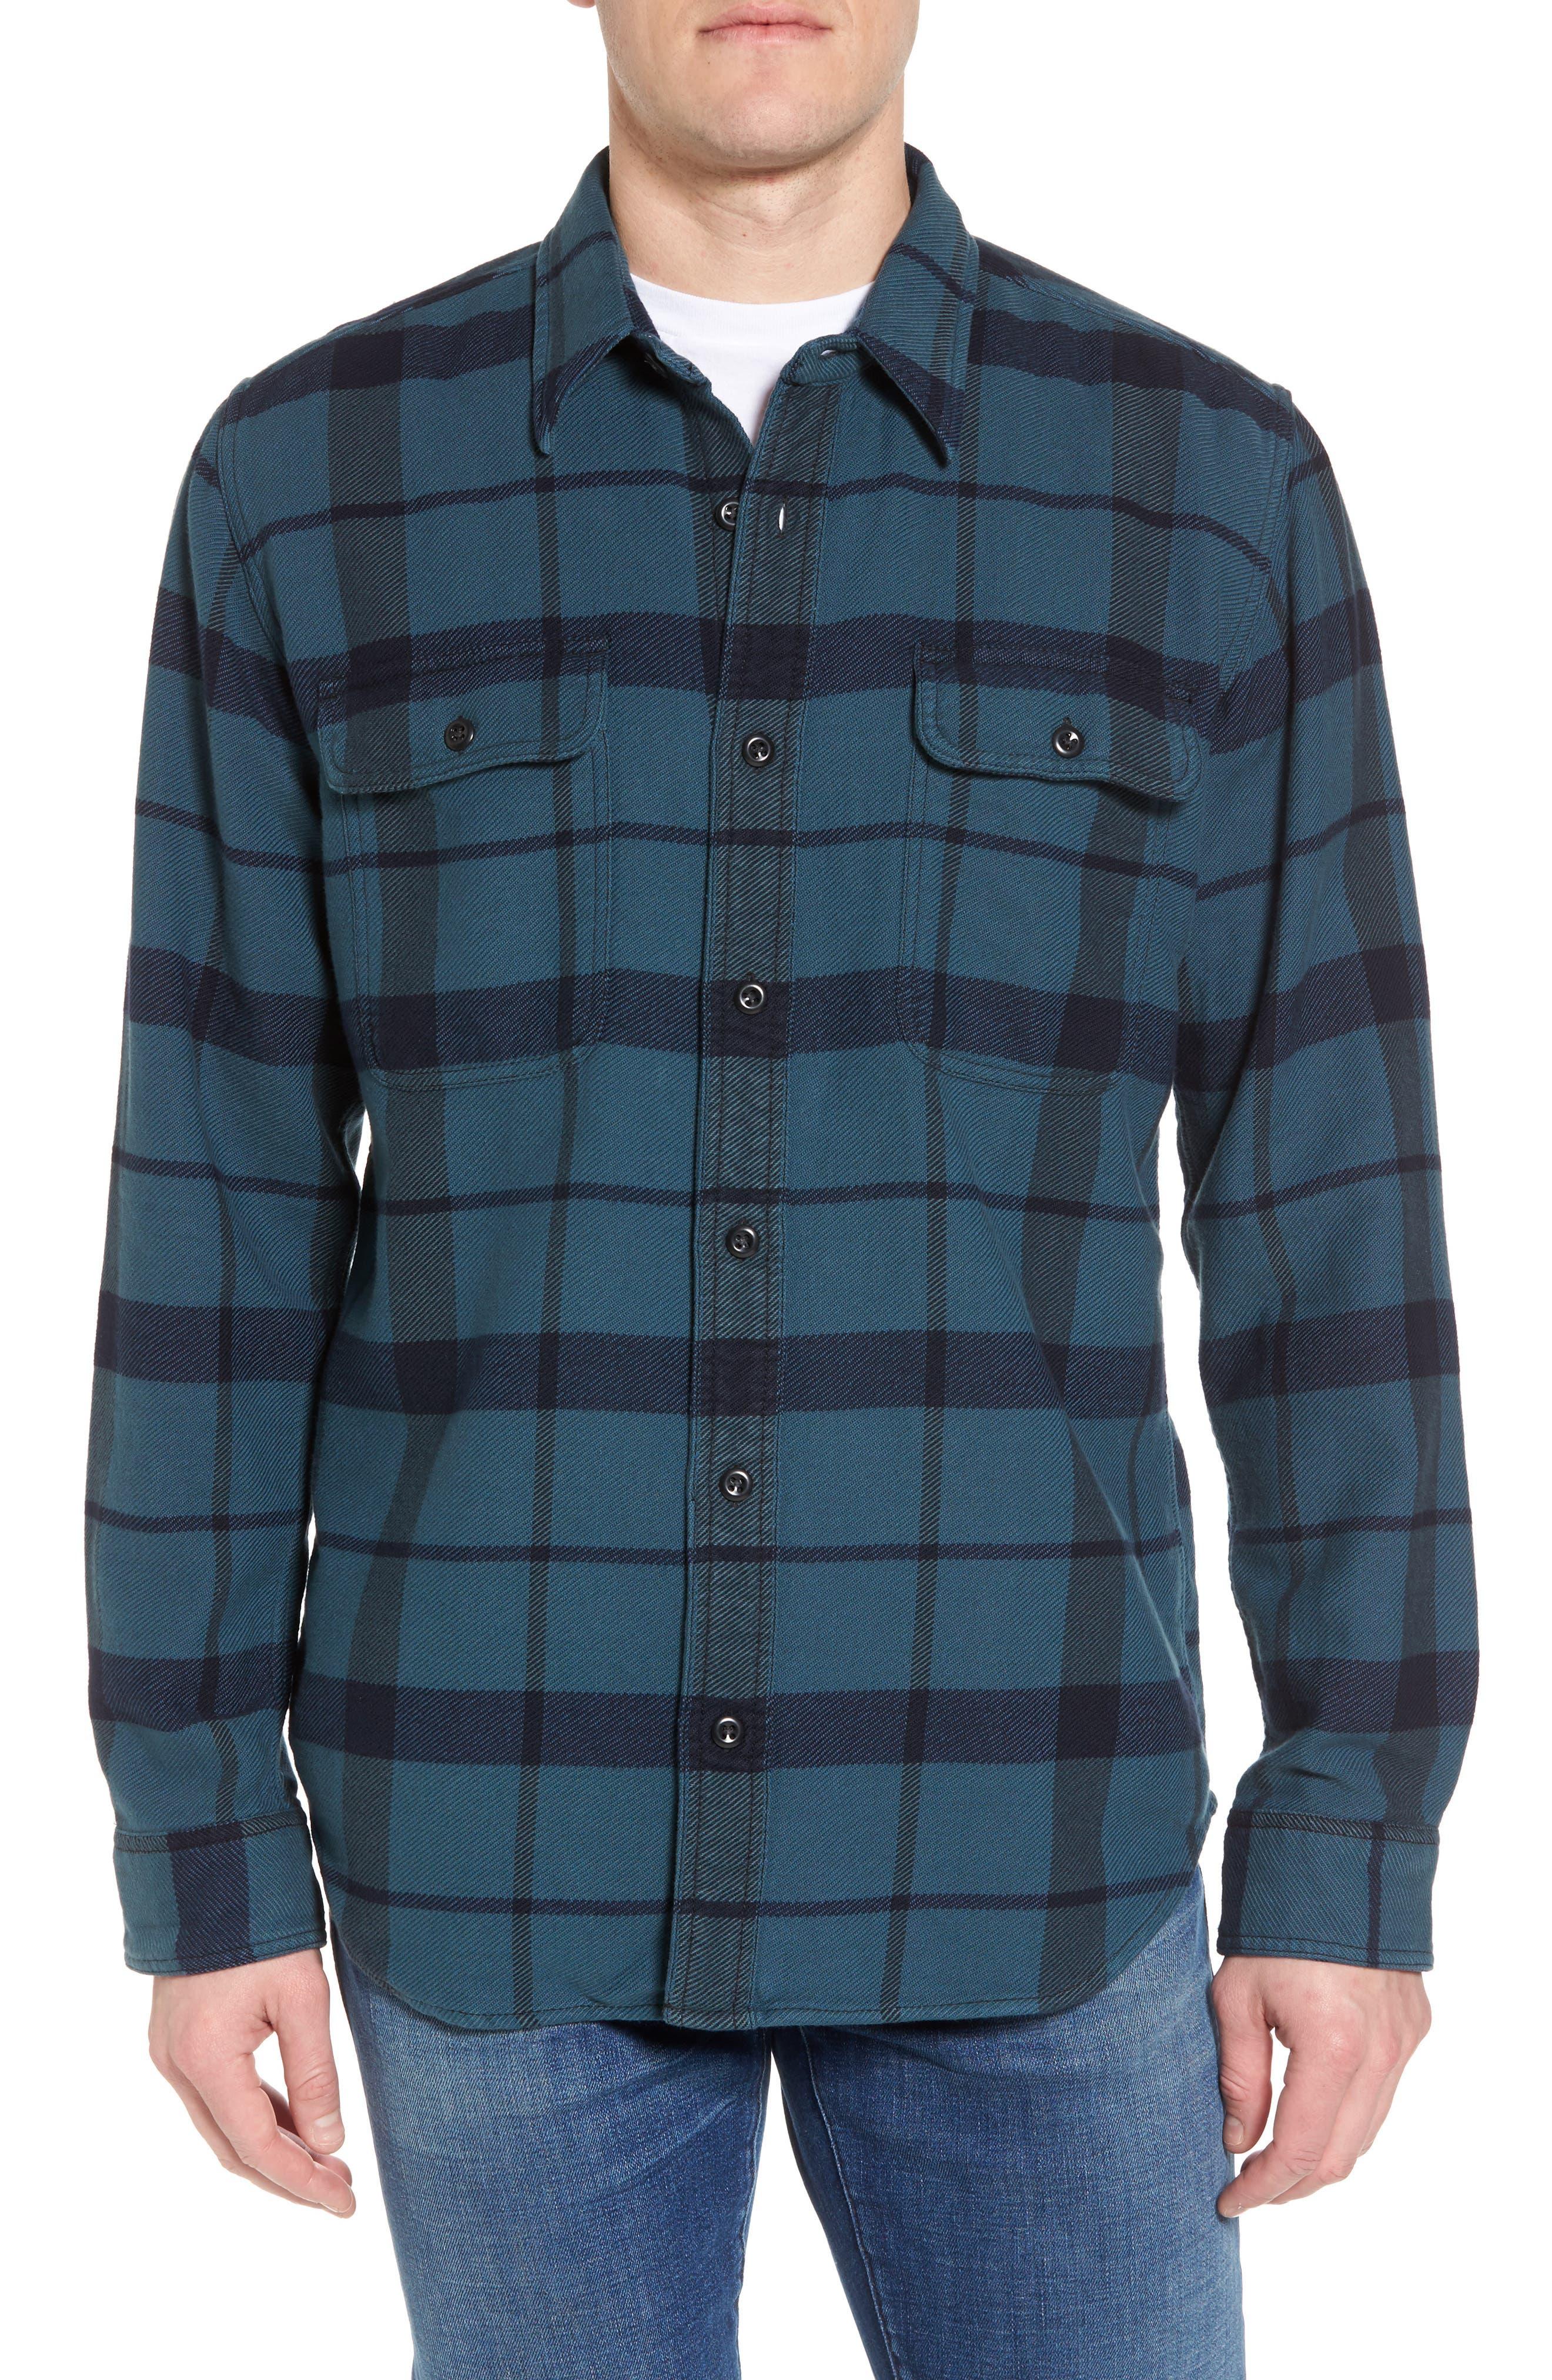 'Vintage Flannel' Regular Fit Plaid Cotton Shirt,                             Main thumbnail 1, color,                             Brown/ Navy